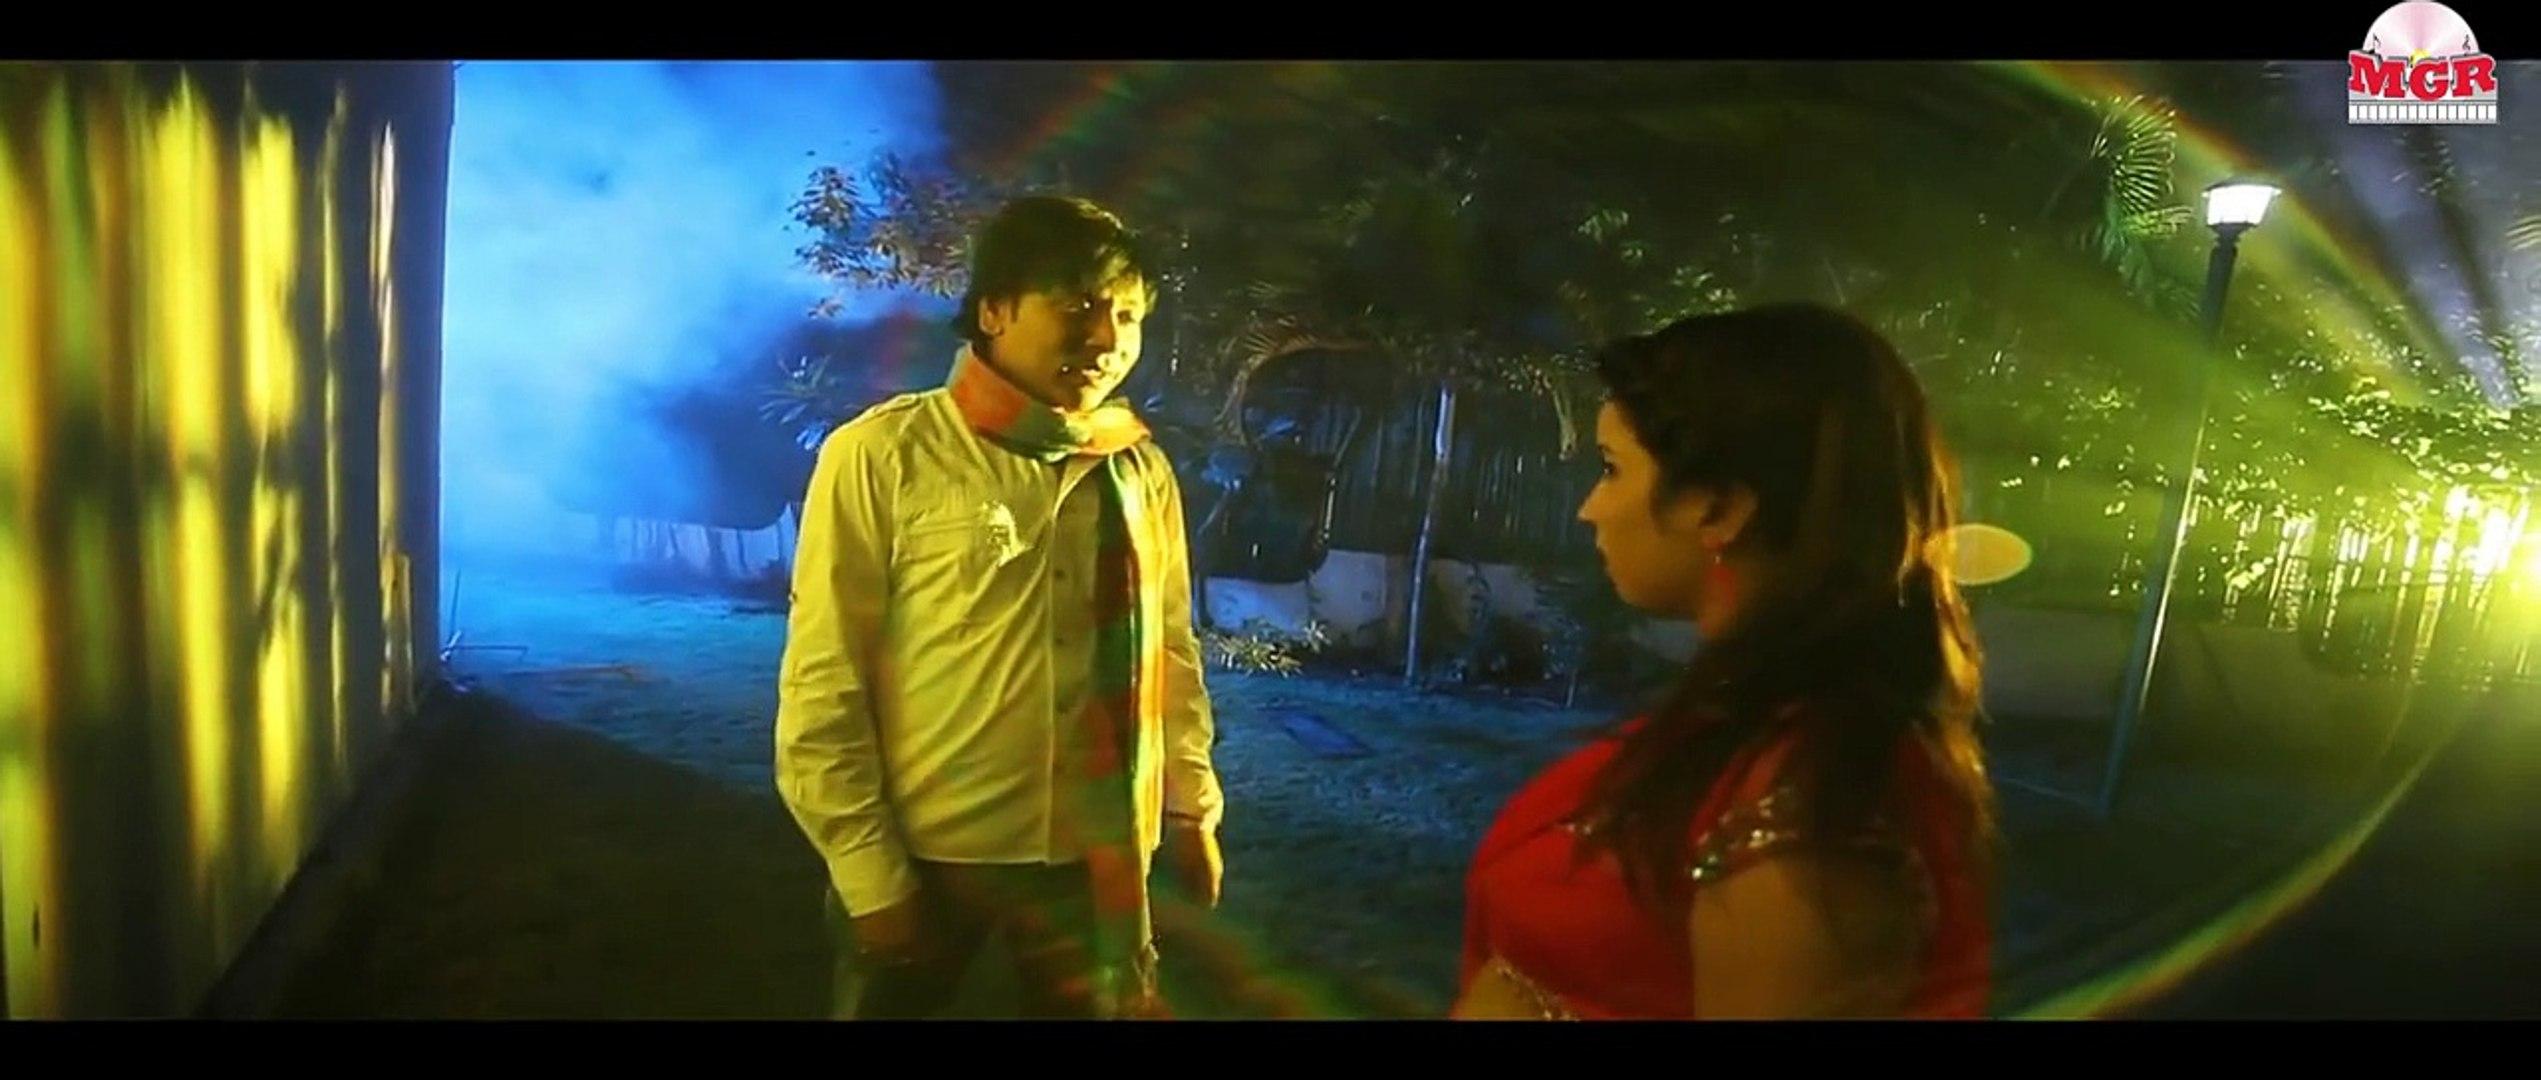 A Decision Maker - Geet Gaata Chal Hindi Movie Free 113 Showing 1 ...